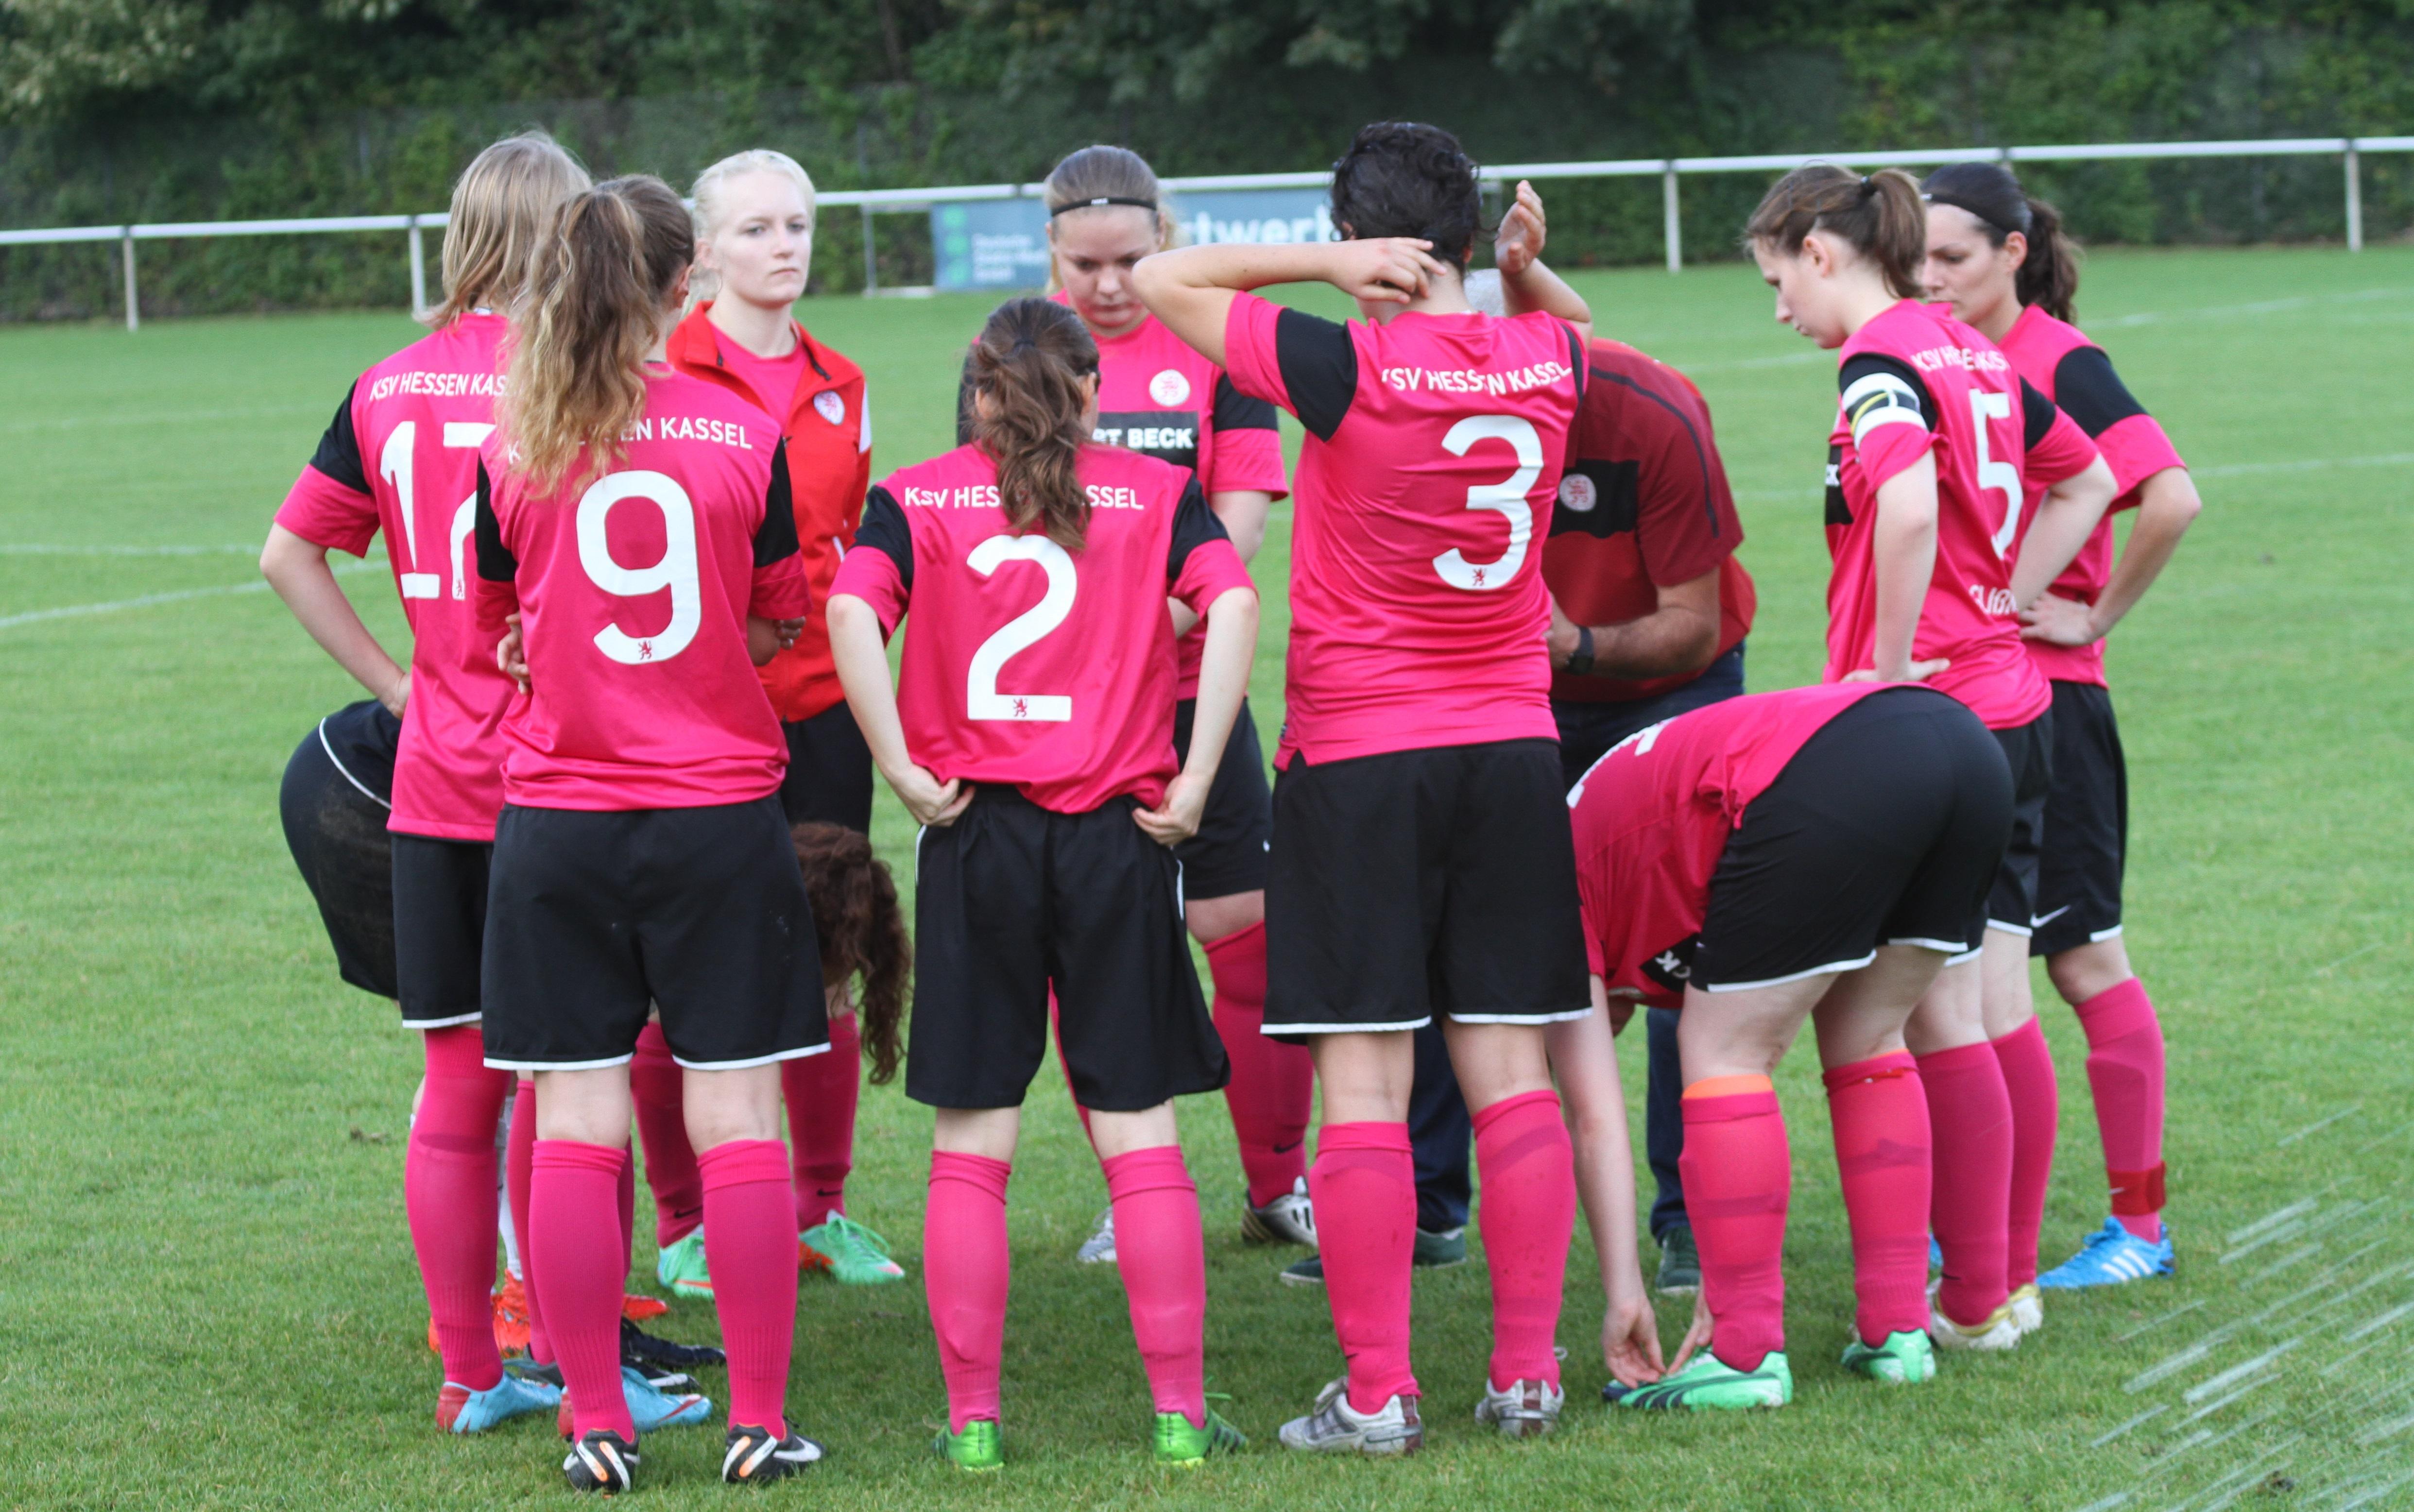 KSV Hessen Frauen - Vikt. Grossenenglis: Besprechung vor Spielbeginn